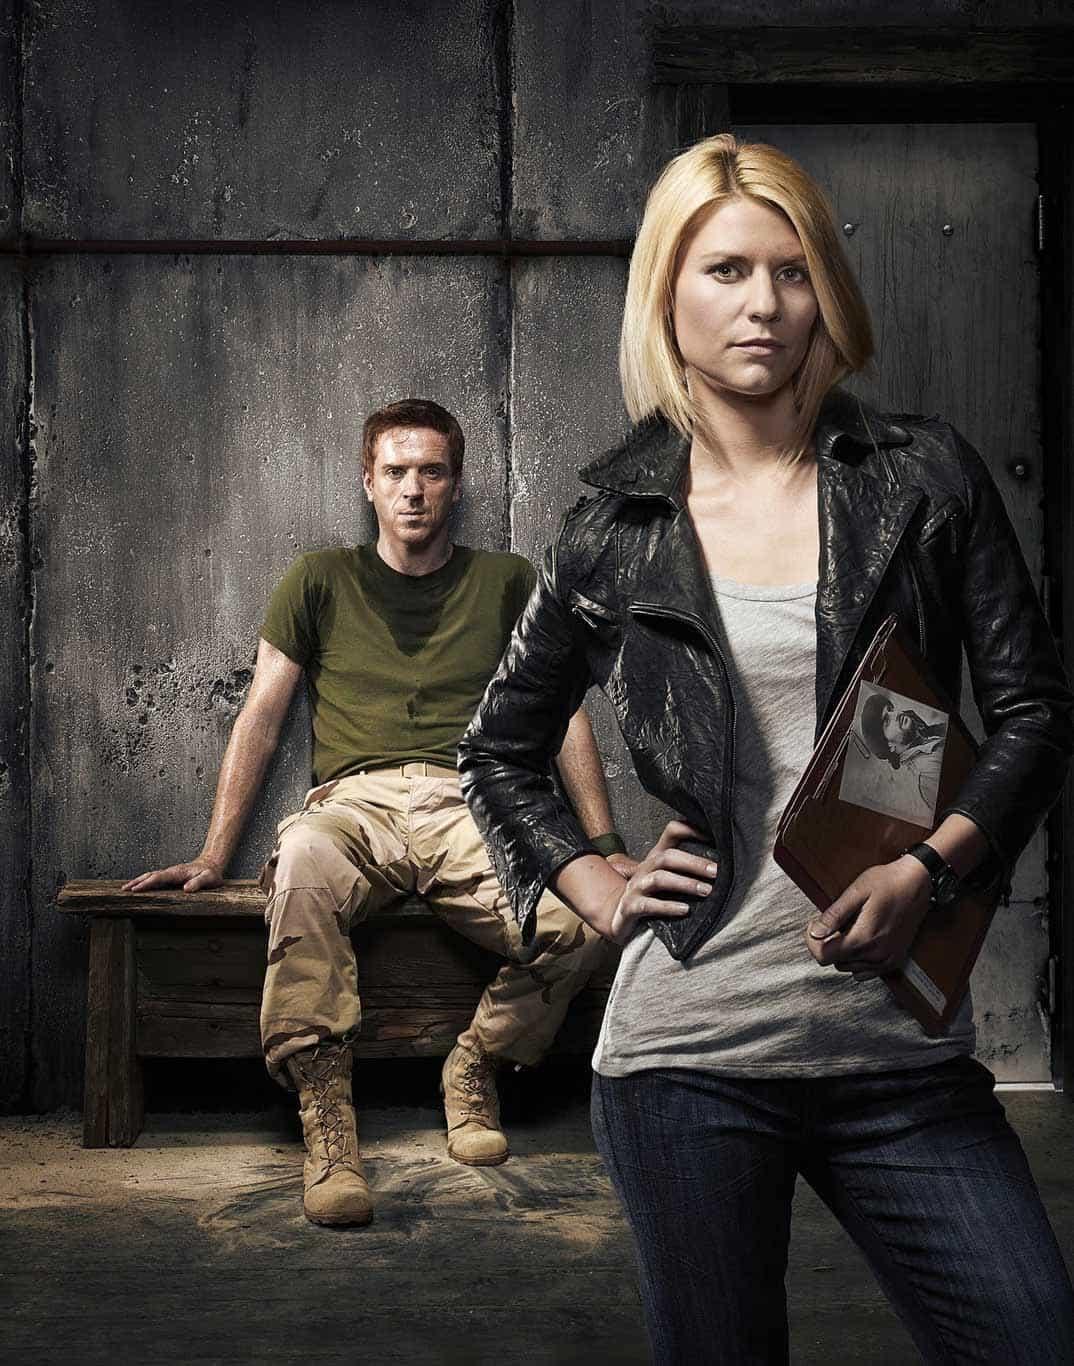 Claire Danes, Damian Lewis © Showtime Networks Inc.